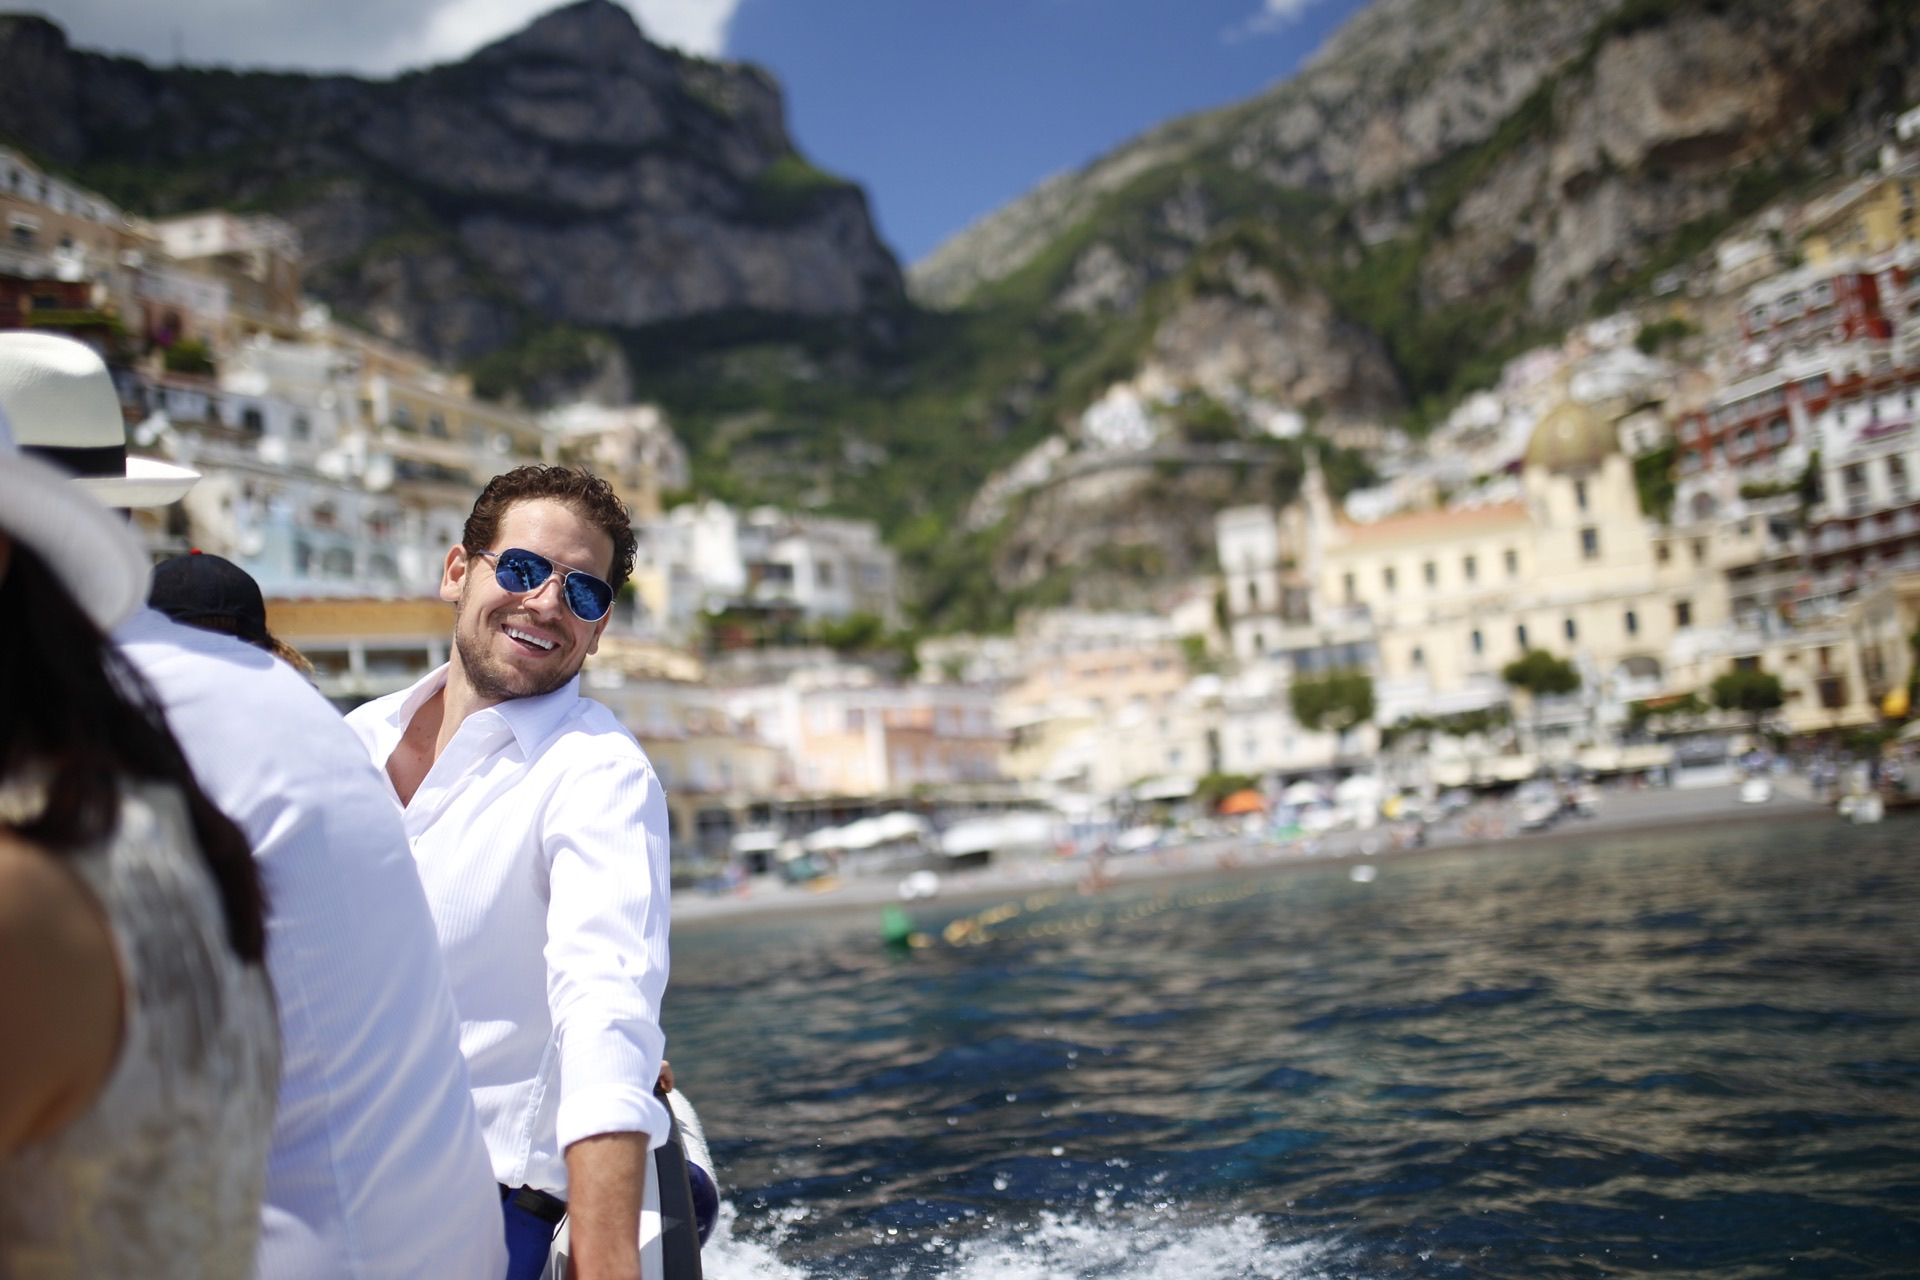 https://www.weddingamalfi.com/wp-content/uploads/Benjamin-on-the-boat-day-2.jpg